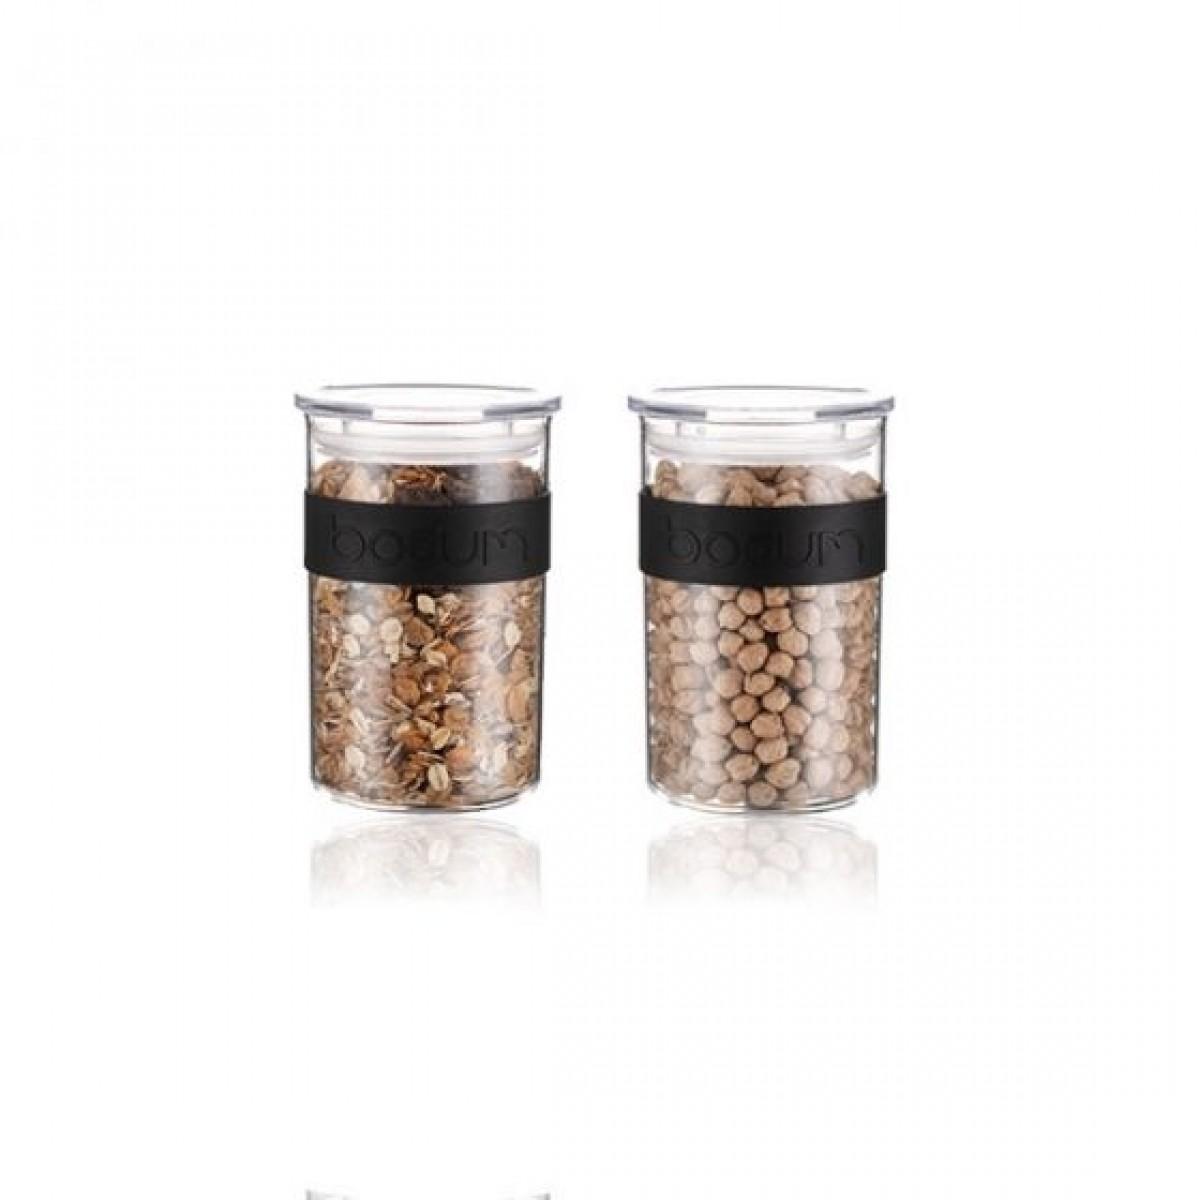 BODUM Opbevaringsglas presso 0,6 ltr brudsikkert 2 stk